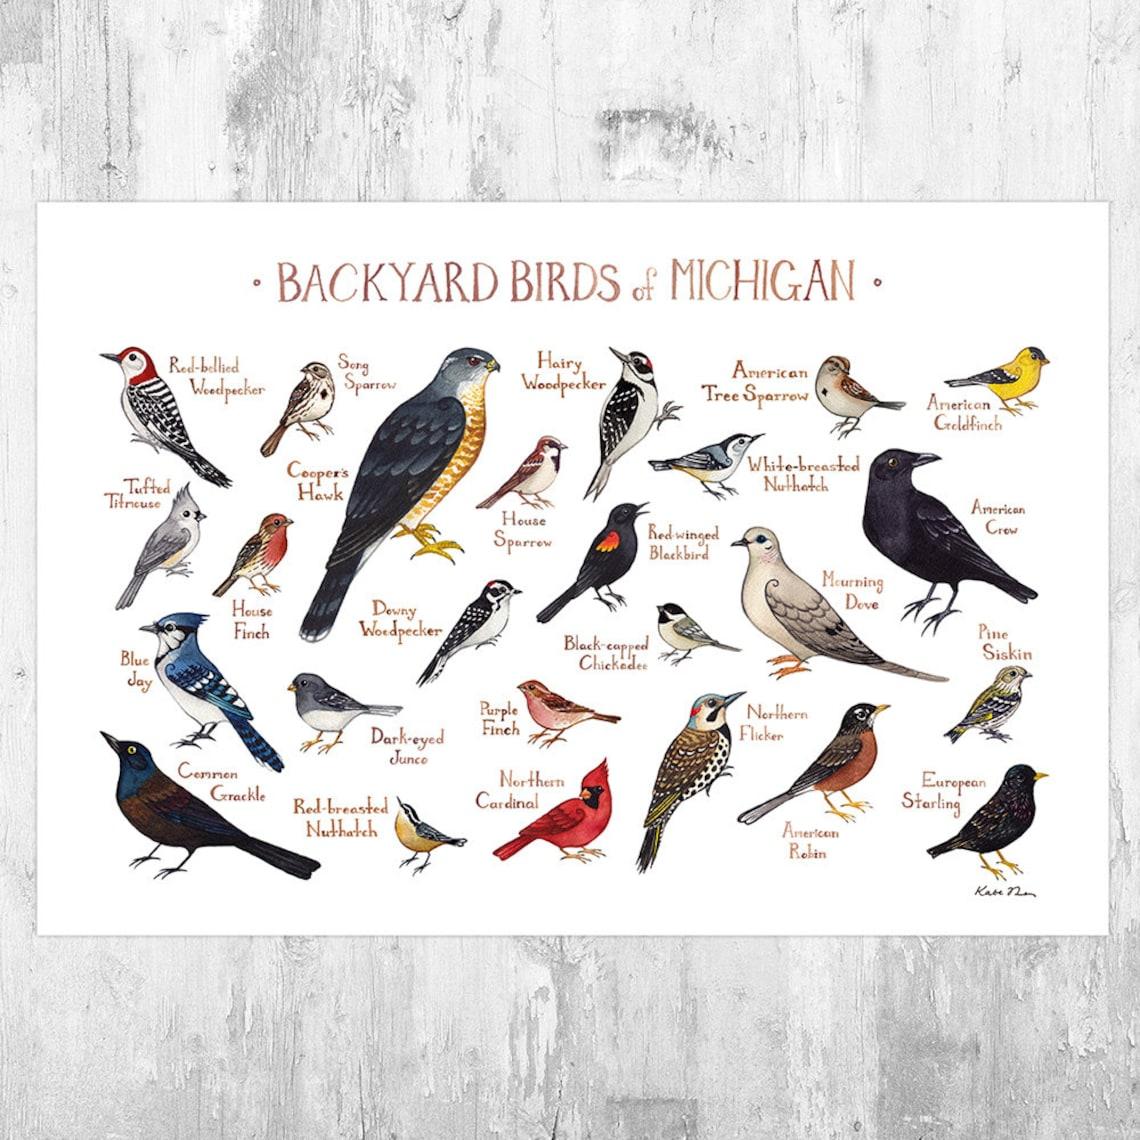 Michigan Backyard Birds Field Guide Art Print / Watercolor image 0